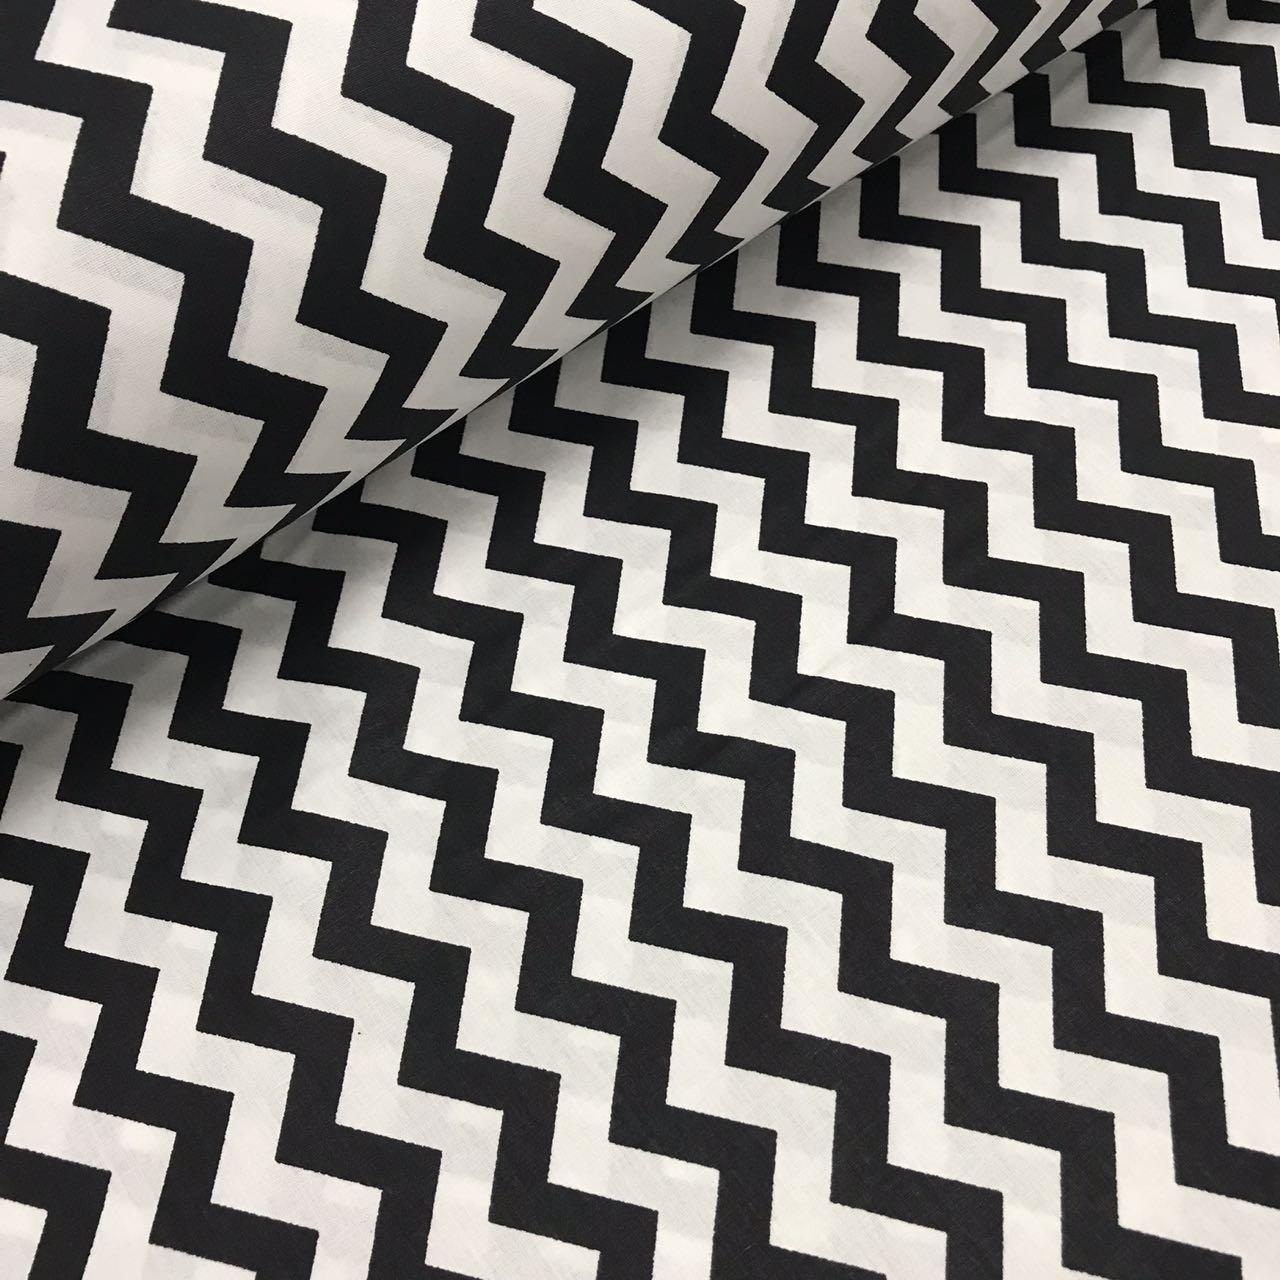 Хлопковая ткань (ТУРЦИЯ шир. 2,4 м) зигзаг черно-белый мелкий